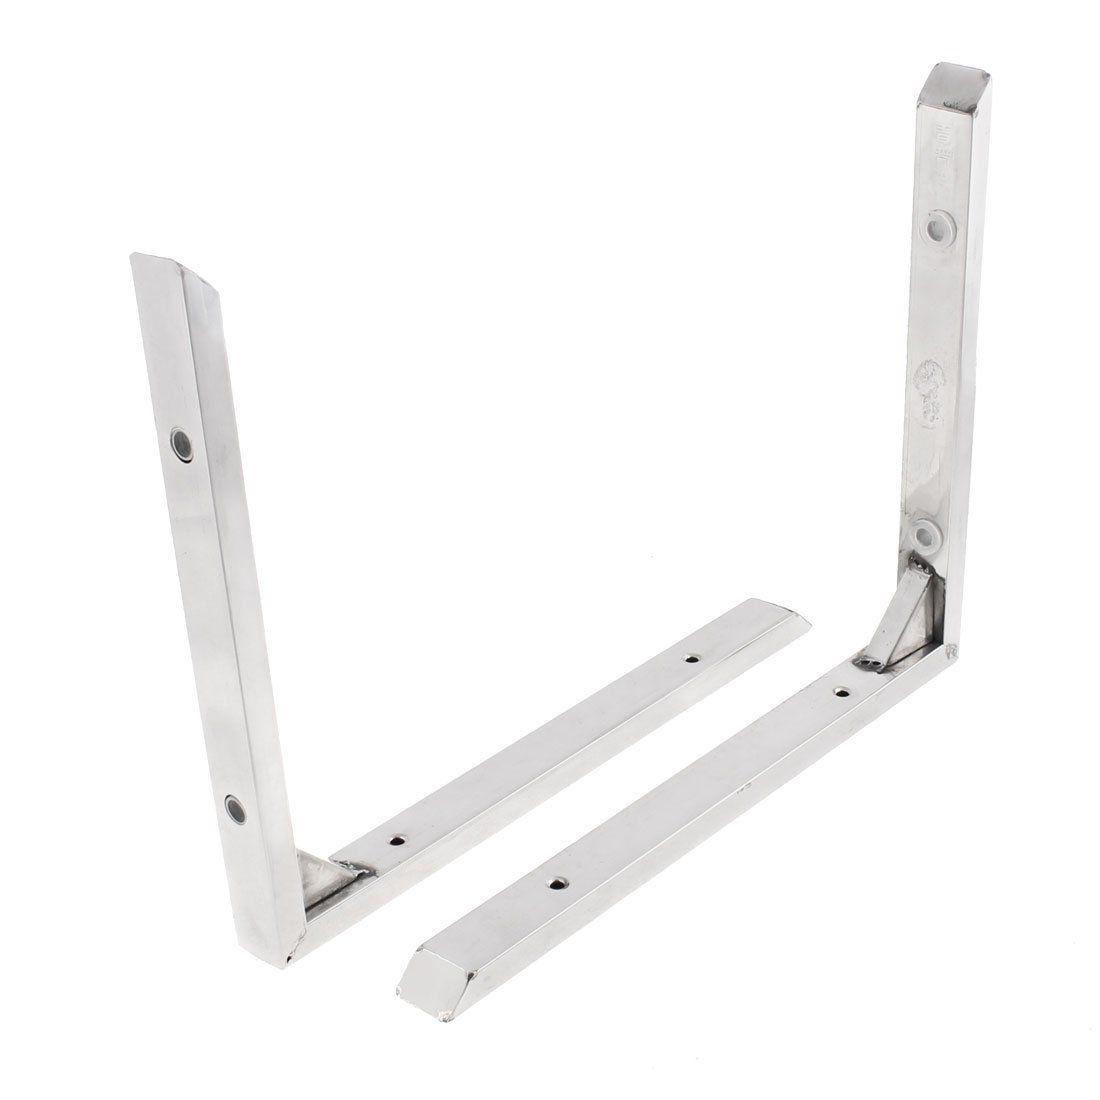 Amazon.com: Stainless Steel 90 Degree Corner Angle Bracket 12 ...